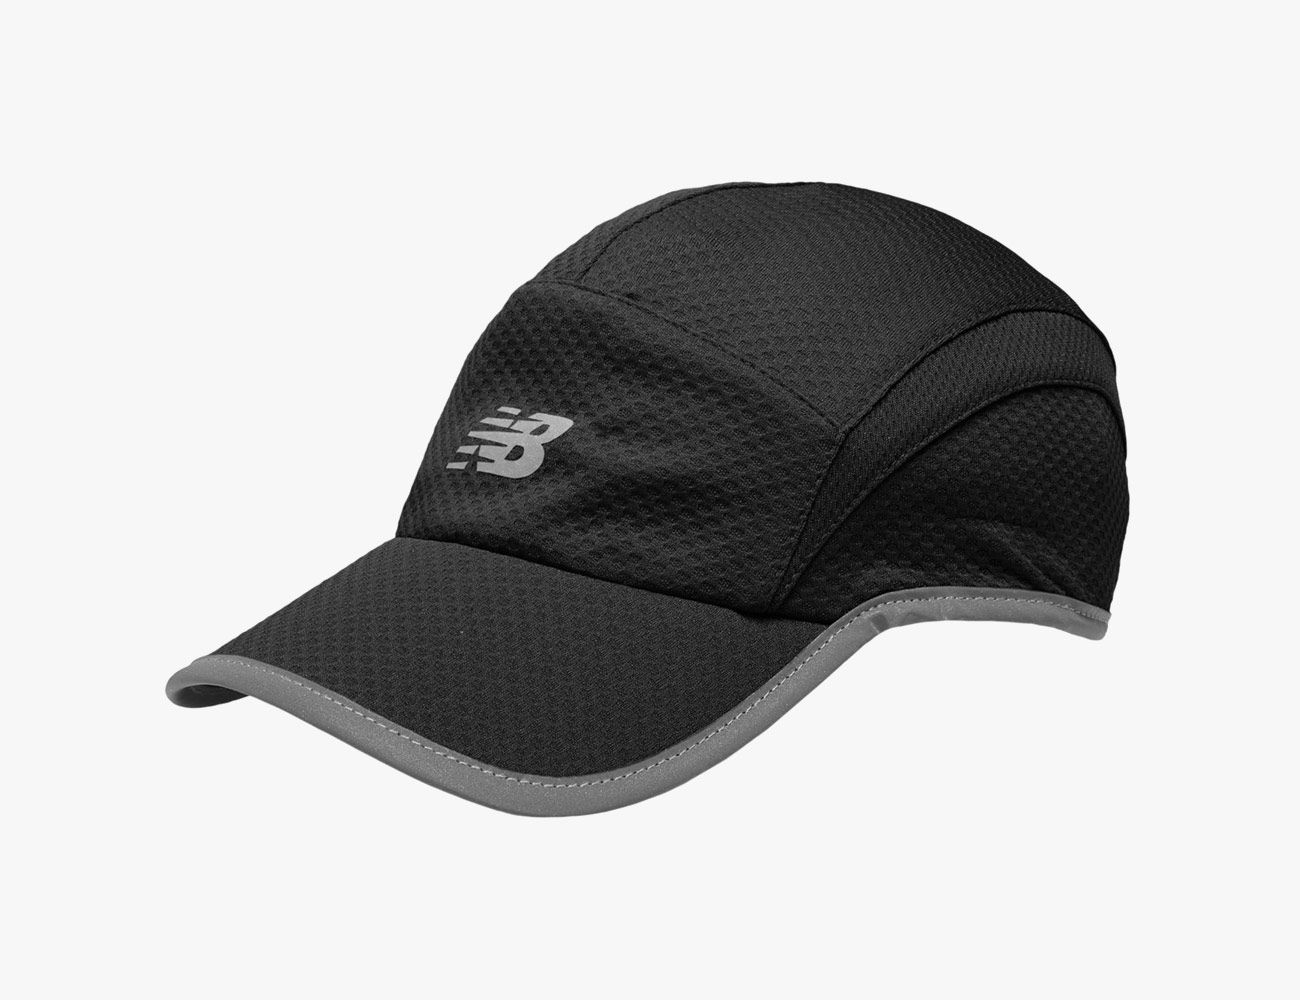 new balance running hat